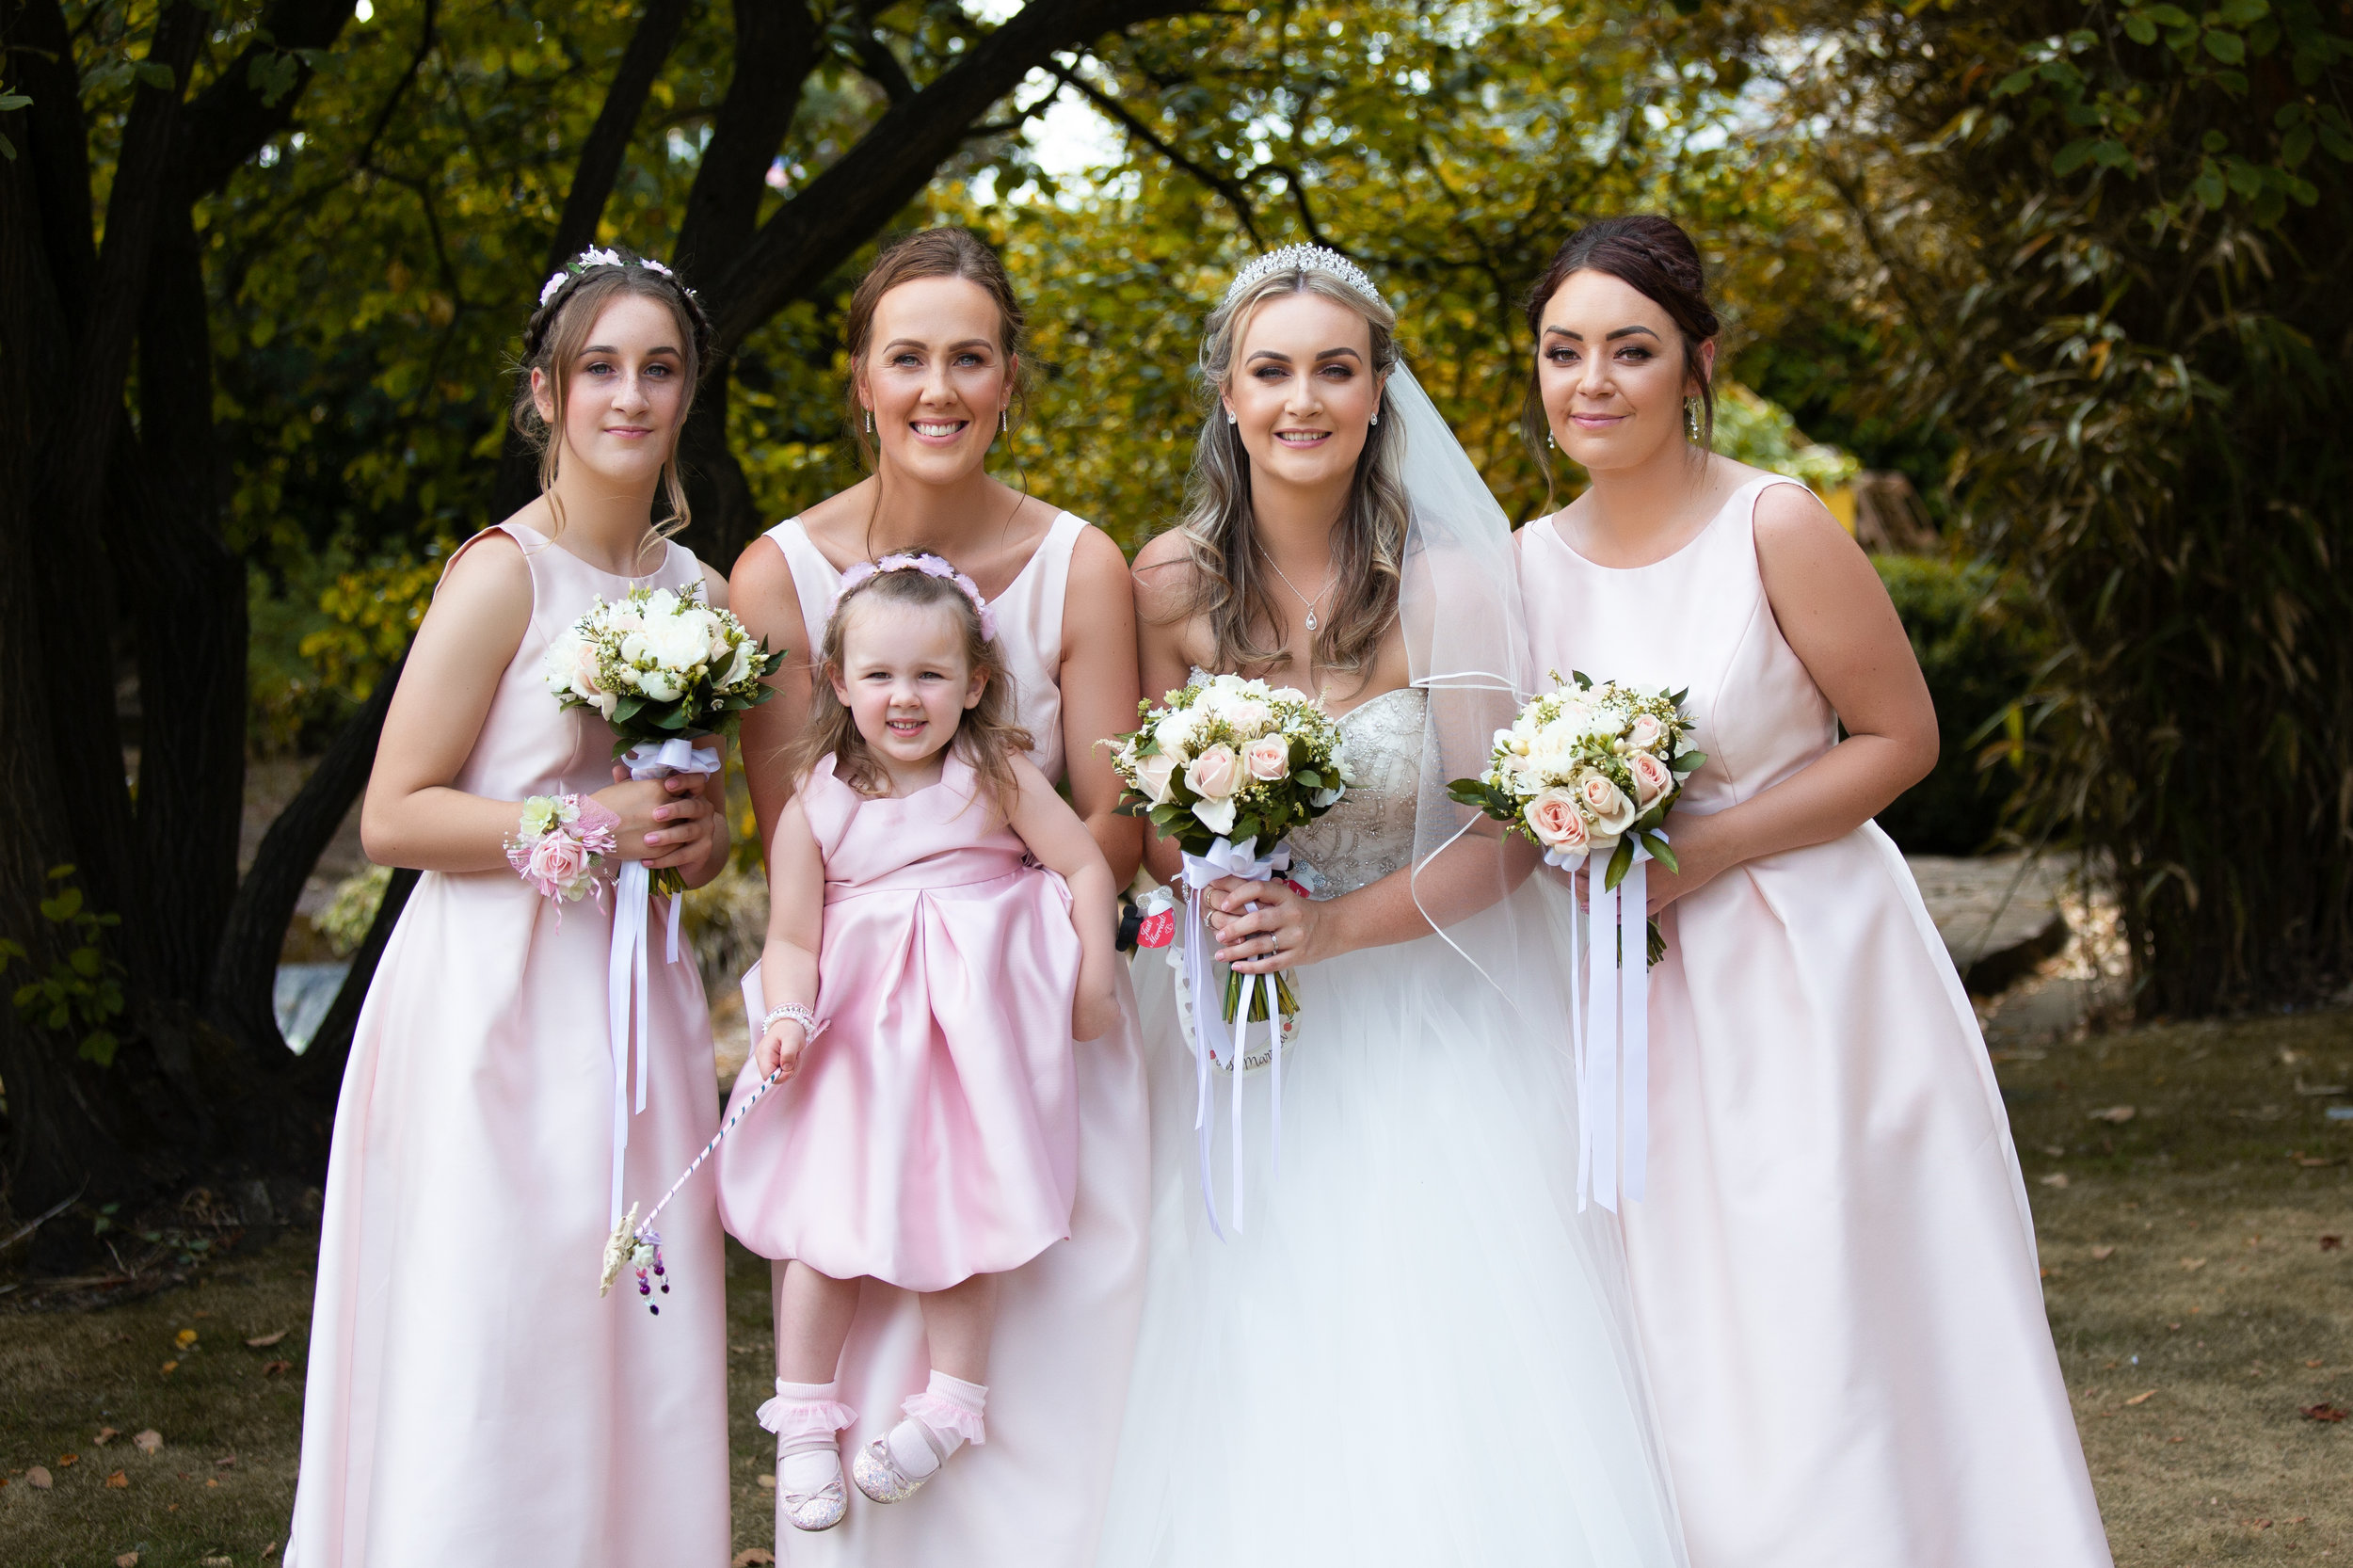 wedding-lea-cooper-photography-willenhall-west-midlands-wolverhampton-dudley-birmingham-uk-marriage-hadley-park-east-telford-bridesmaids.jpg